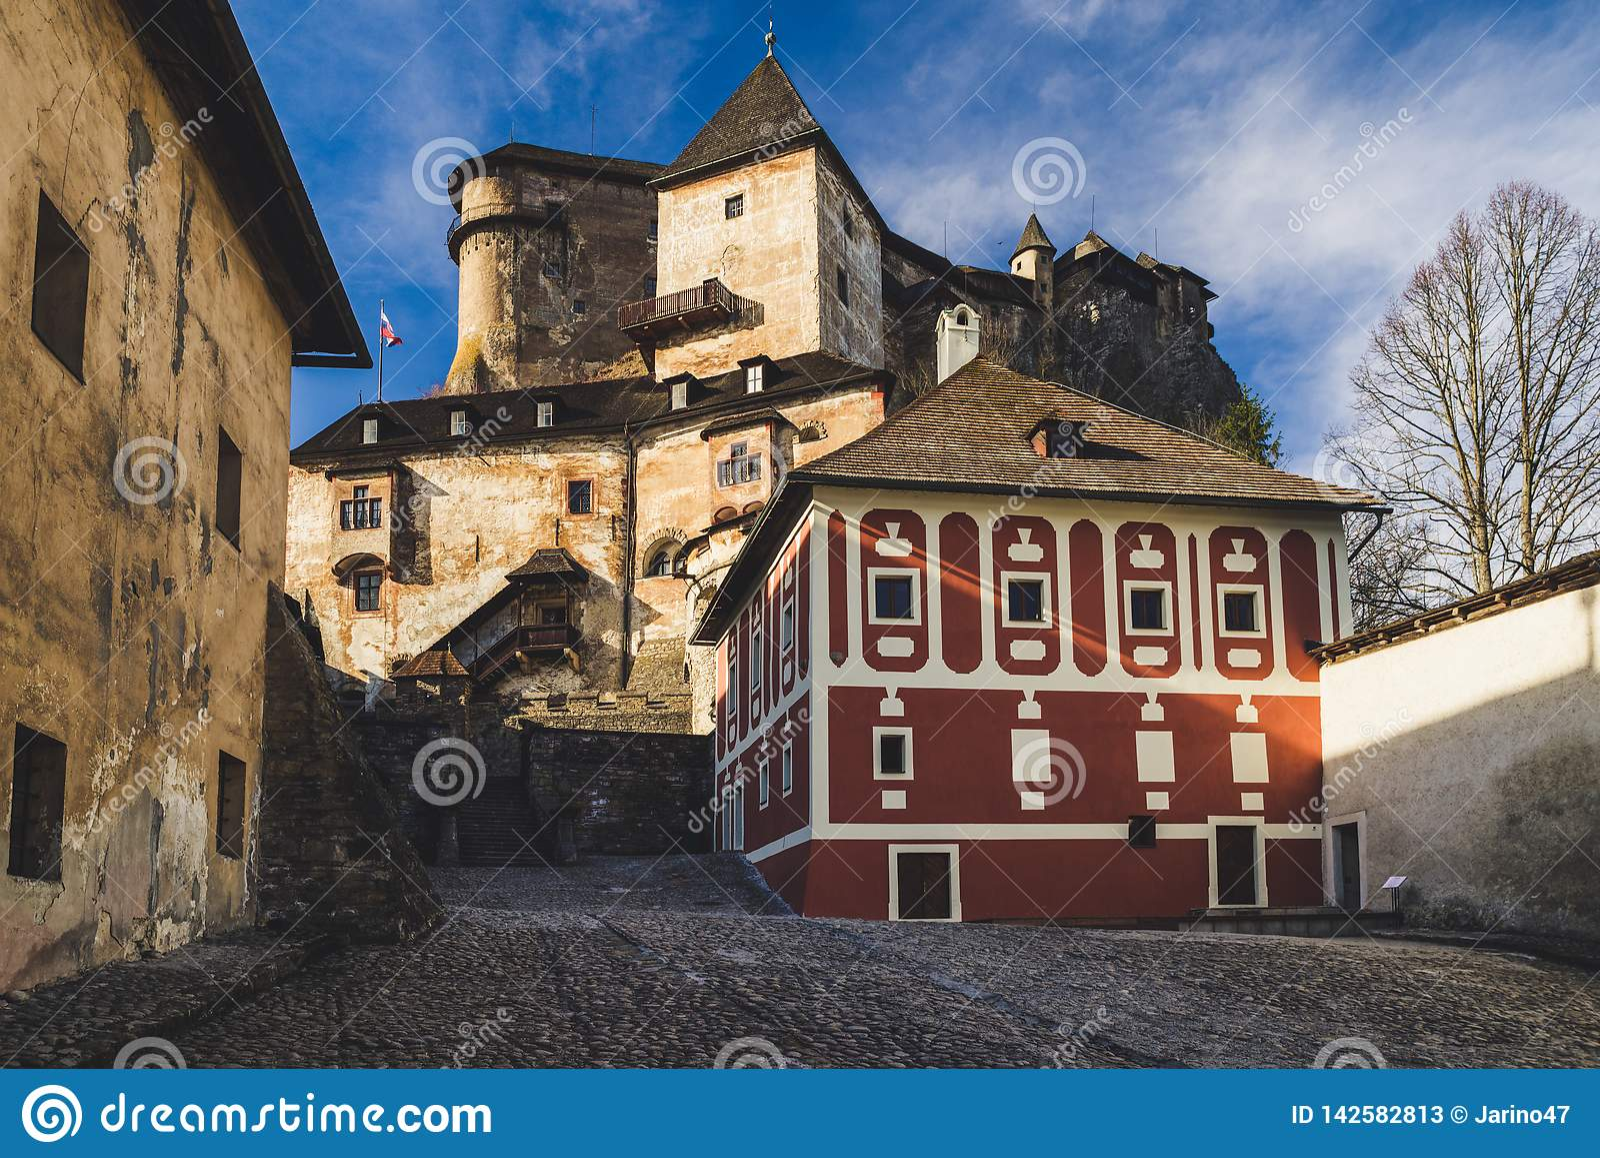 Courtyard at Orava castle, Slovakia